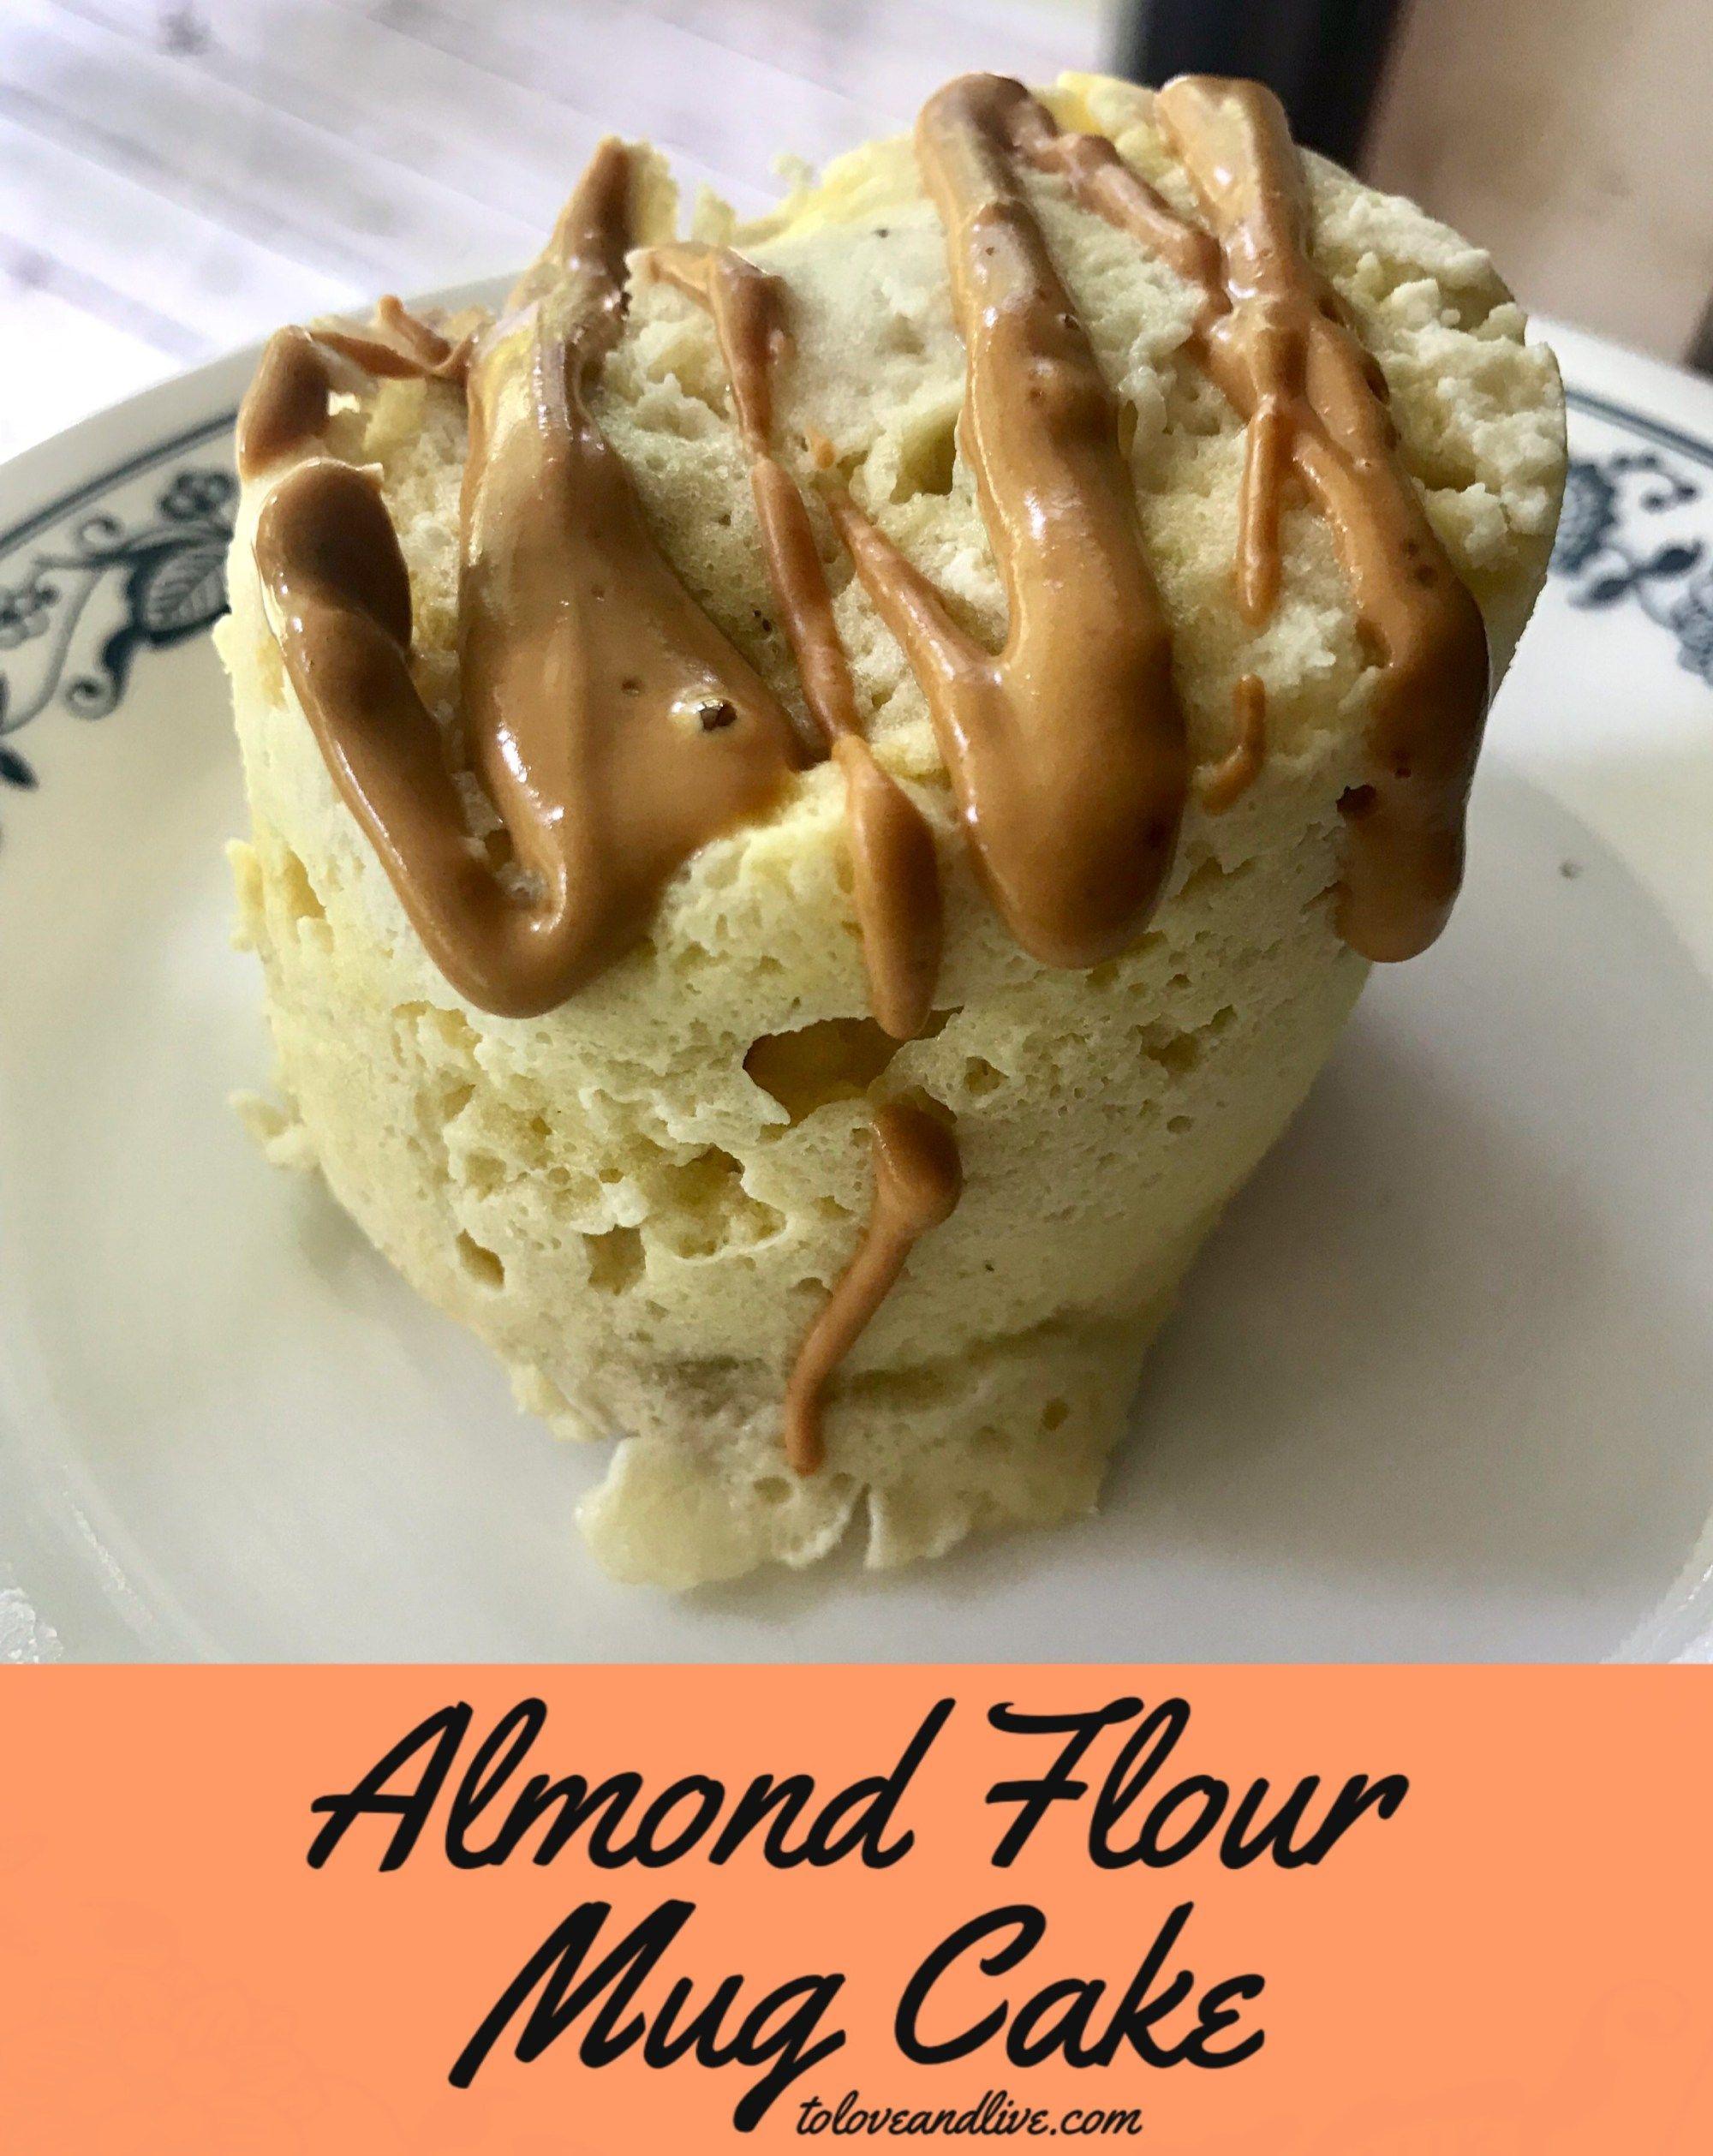 Almond Flour Mug Cake #mugcake